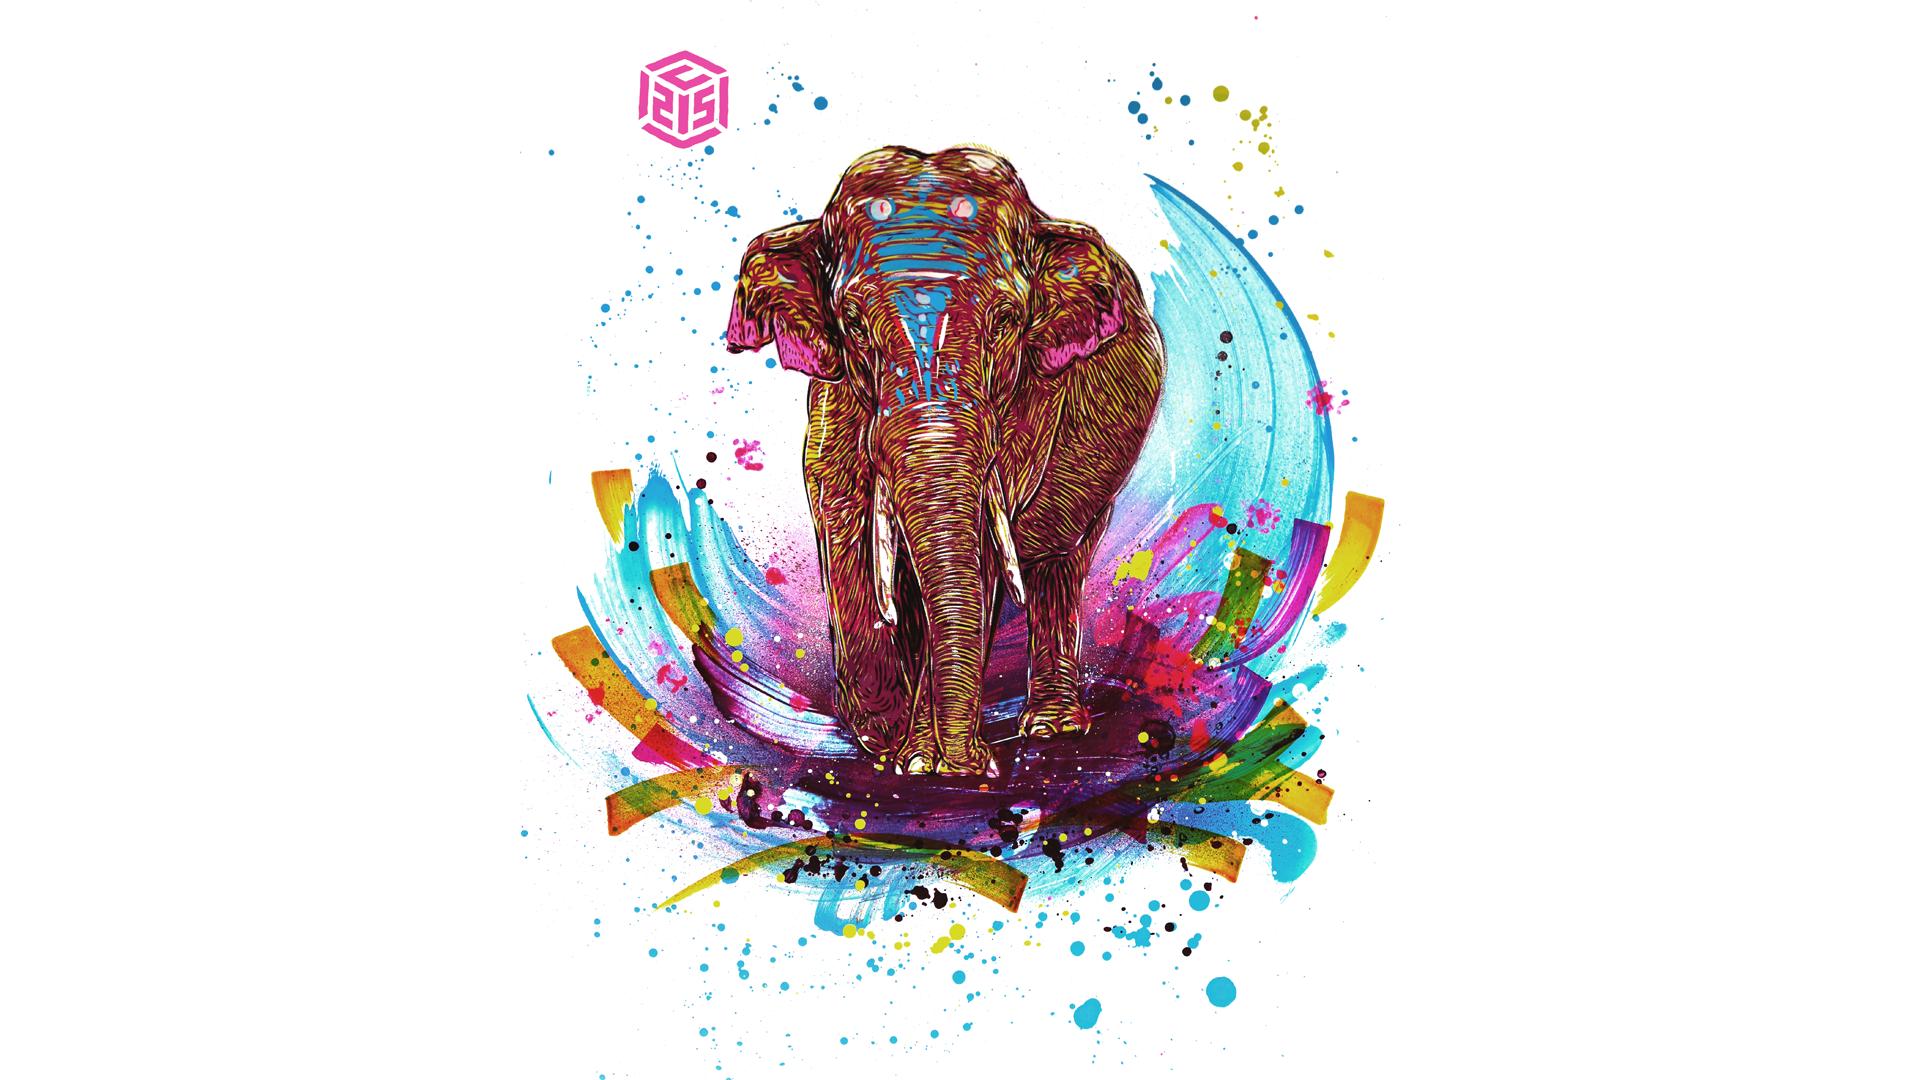 Far Cry 4 Wallpaper Elephant: Image - FC4 C215 Elephant Wallpaper 1920x1080.png